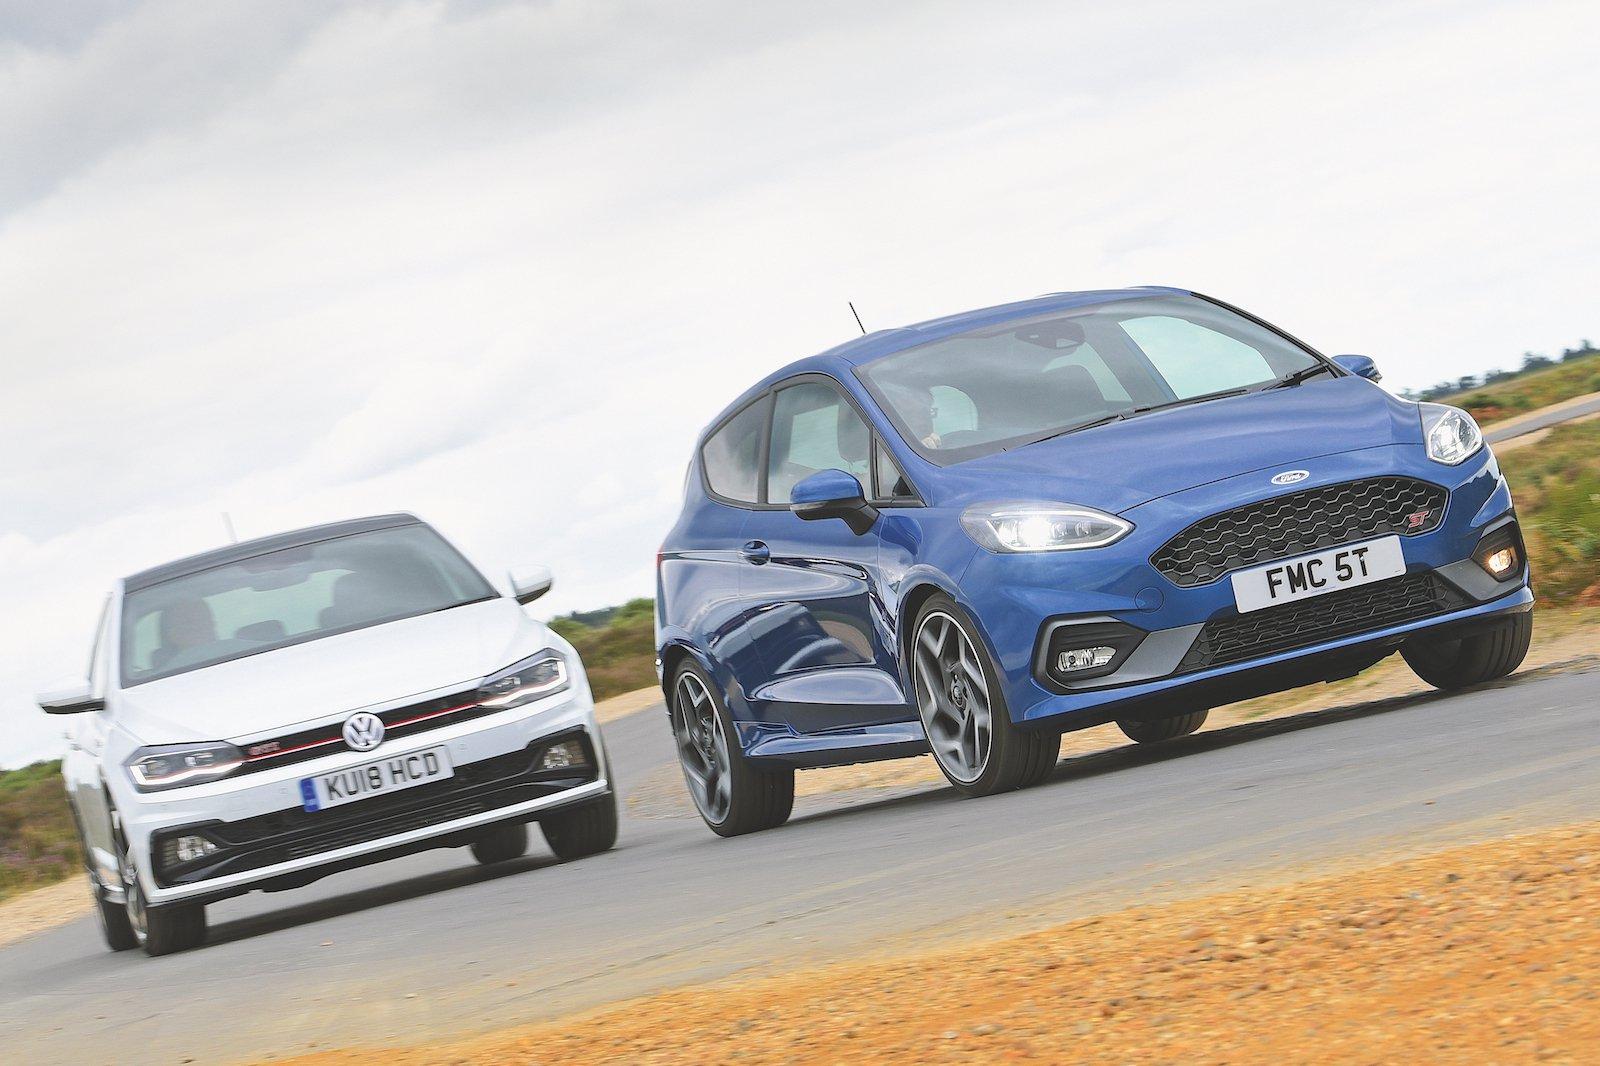 Used test: Ford Fiesta ST vs Volkswagen Polo GTI